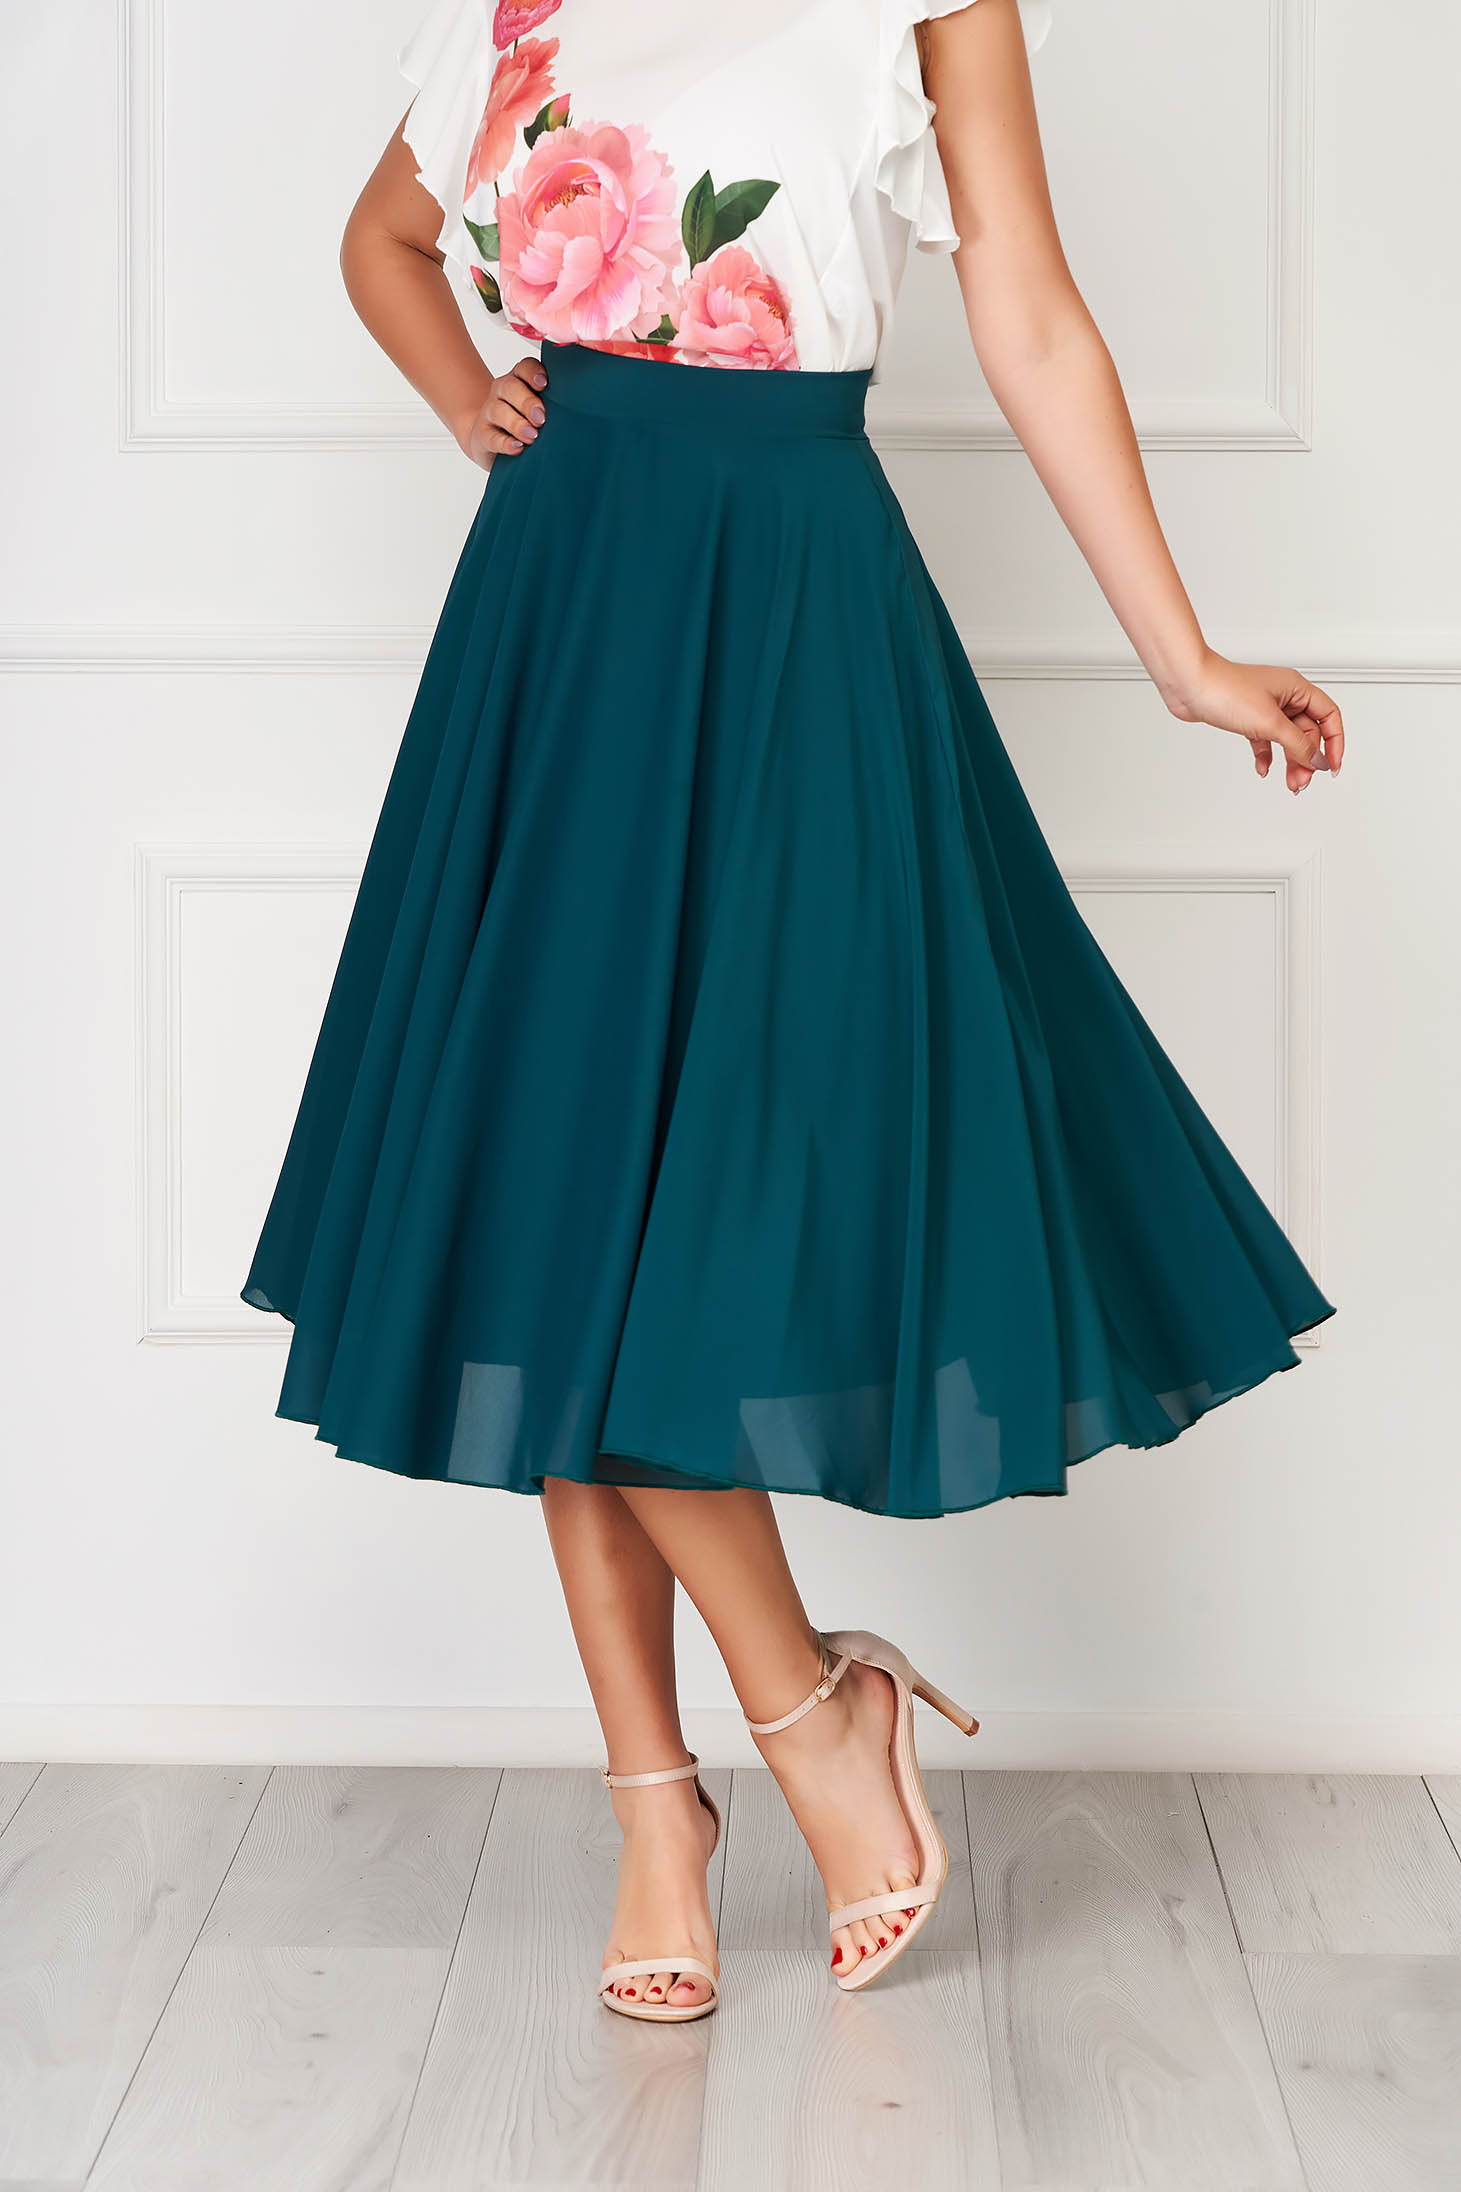 StarShinerS green skirt elegant midi cloche from veil fabric high waisted